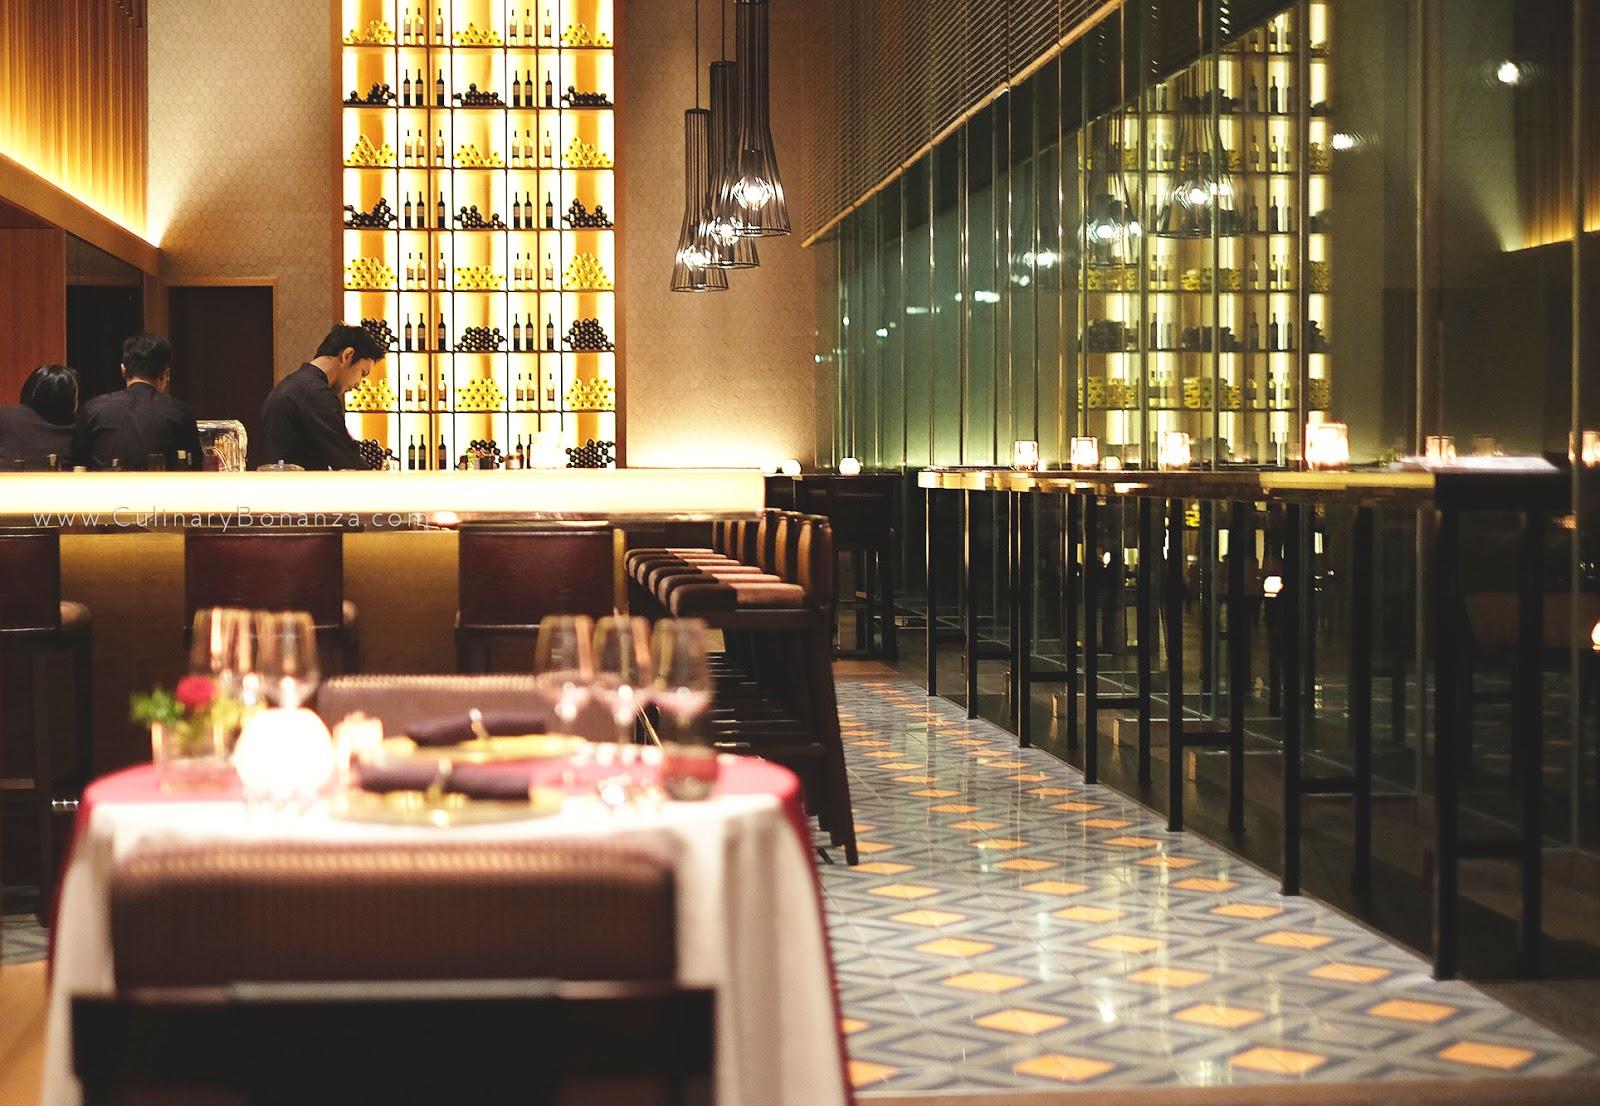 View Restaurant & Bar at Fairmont Hotel Jakarta (www.culinarybonanza.com)